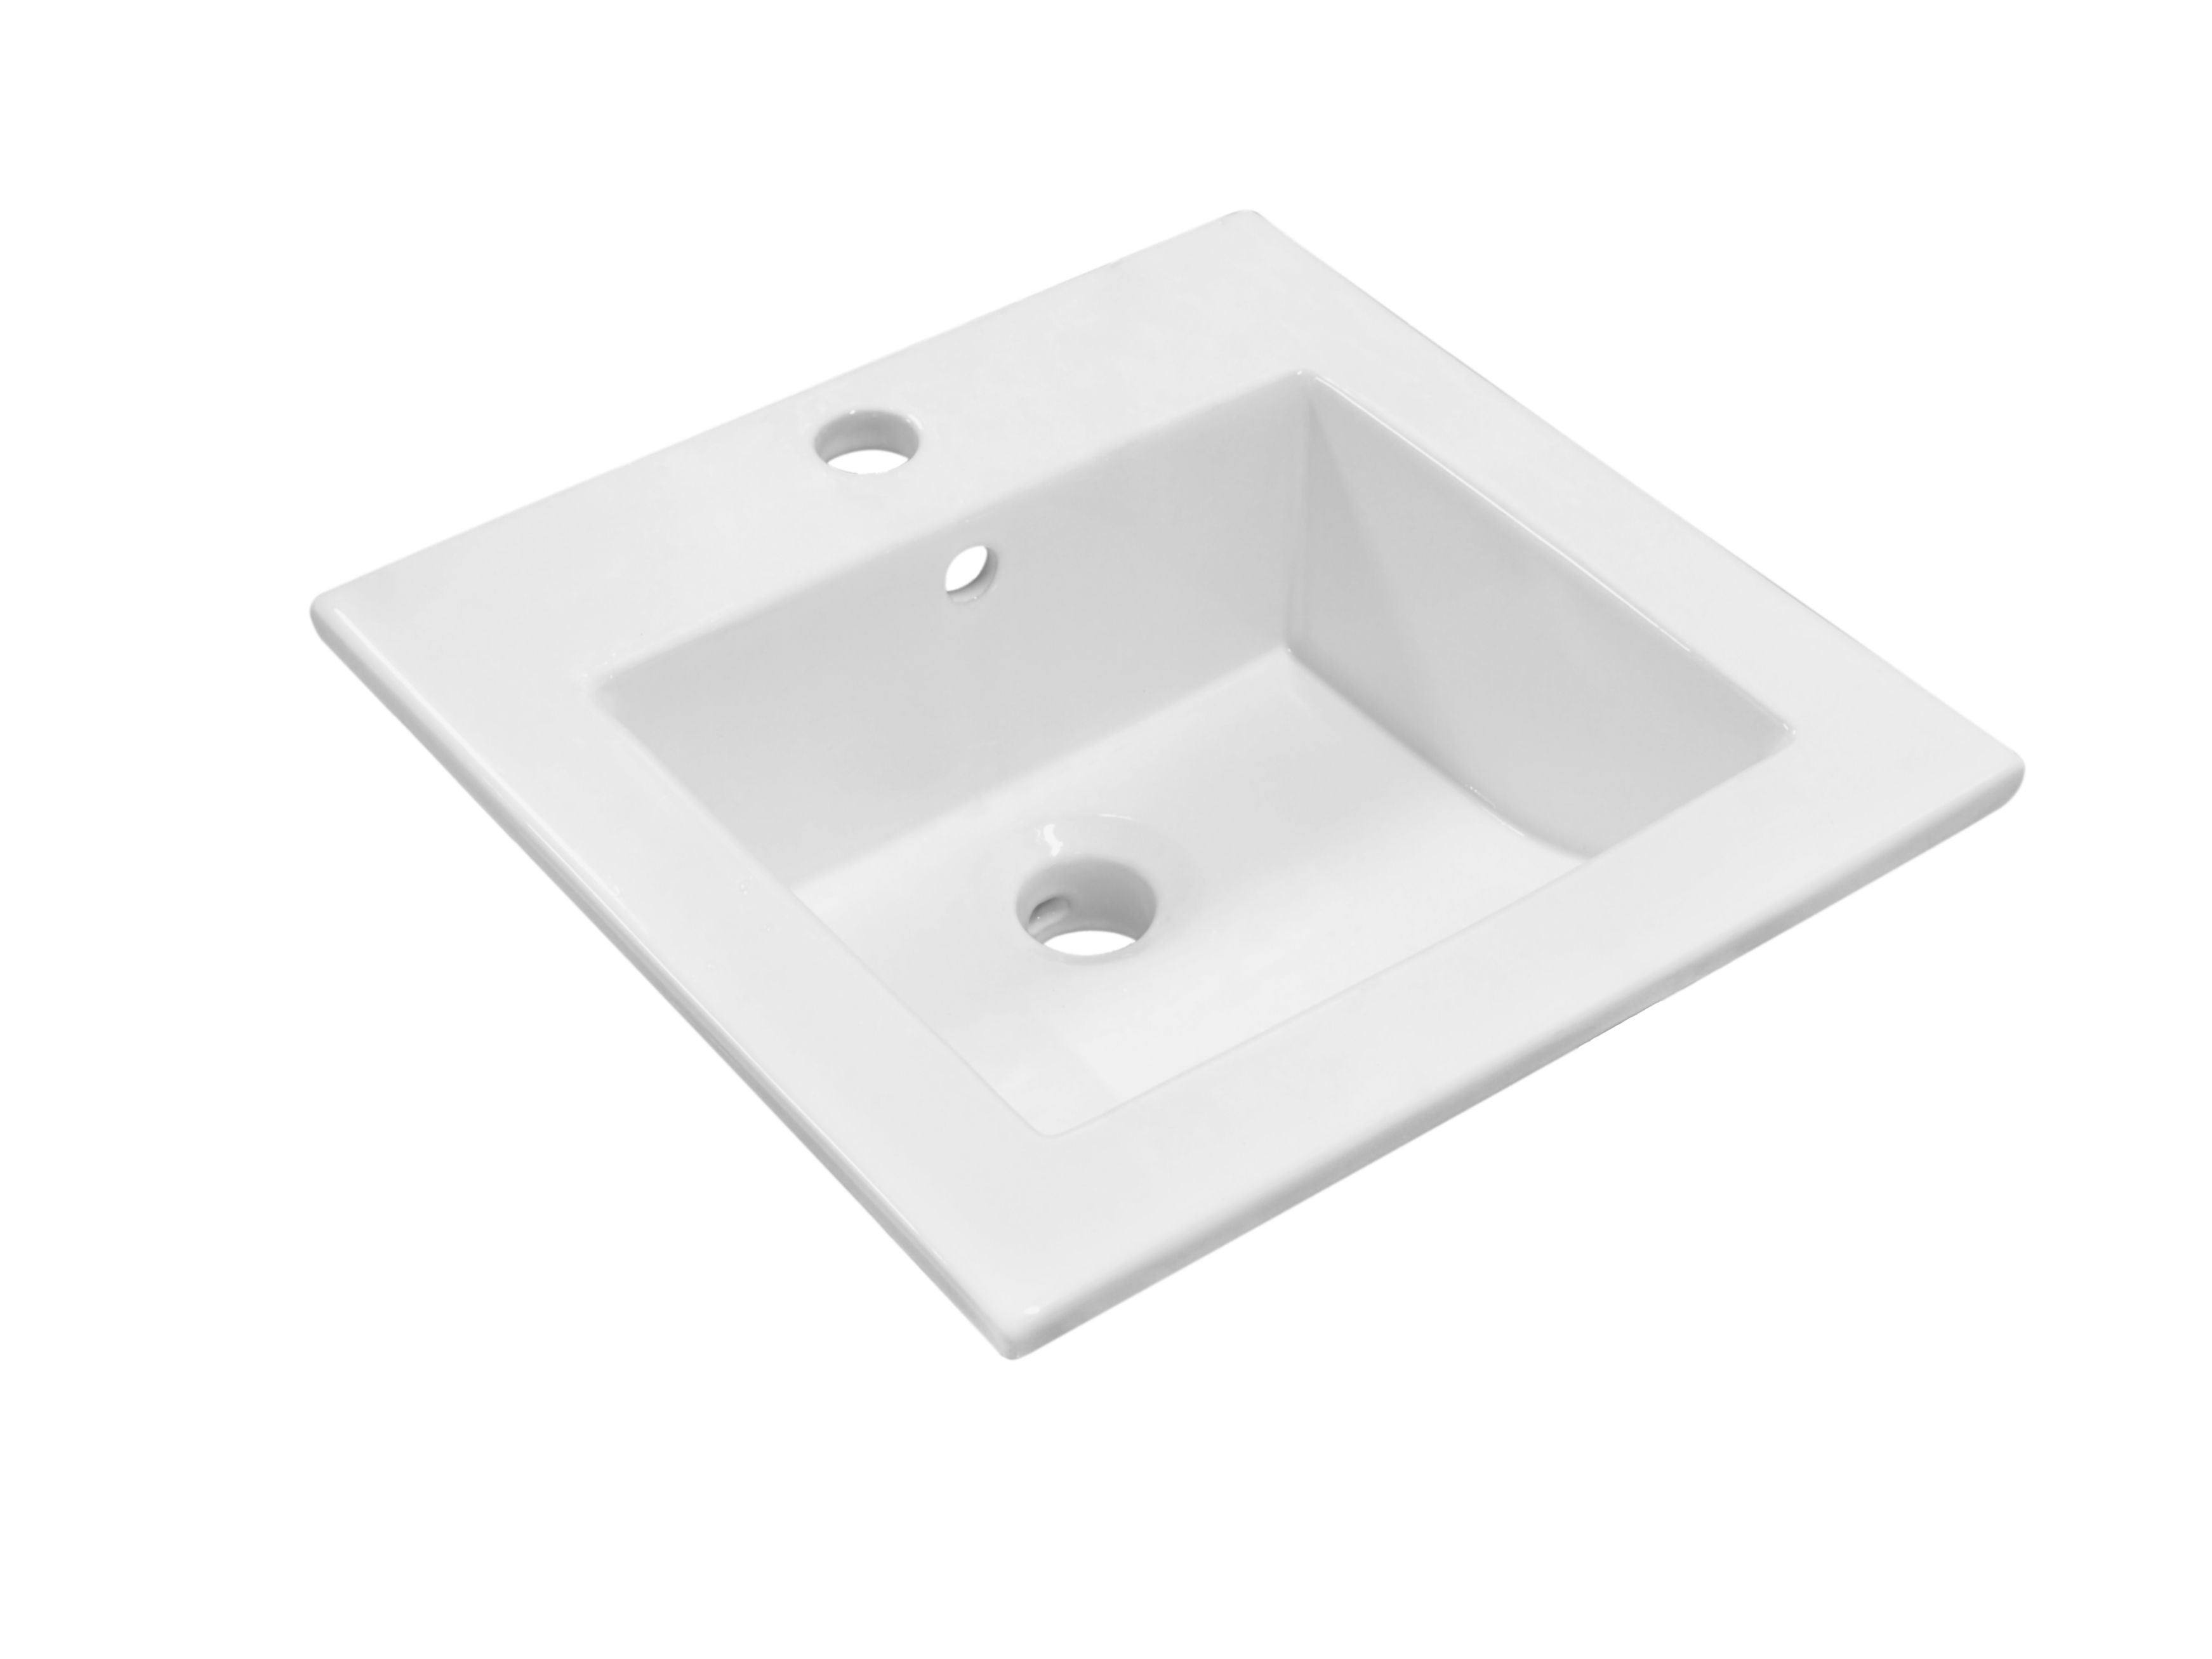 Badkamer accessoires kerra kr inbouw wastafel cm wit